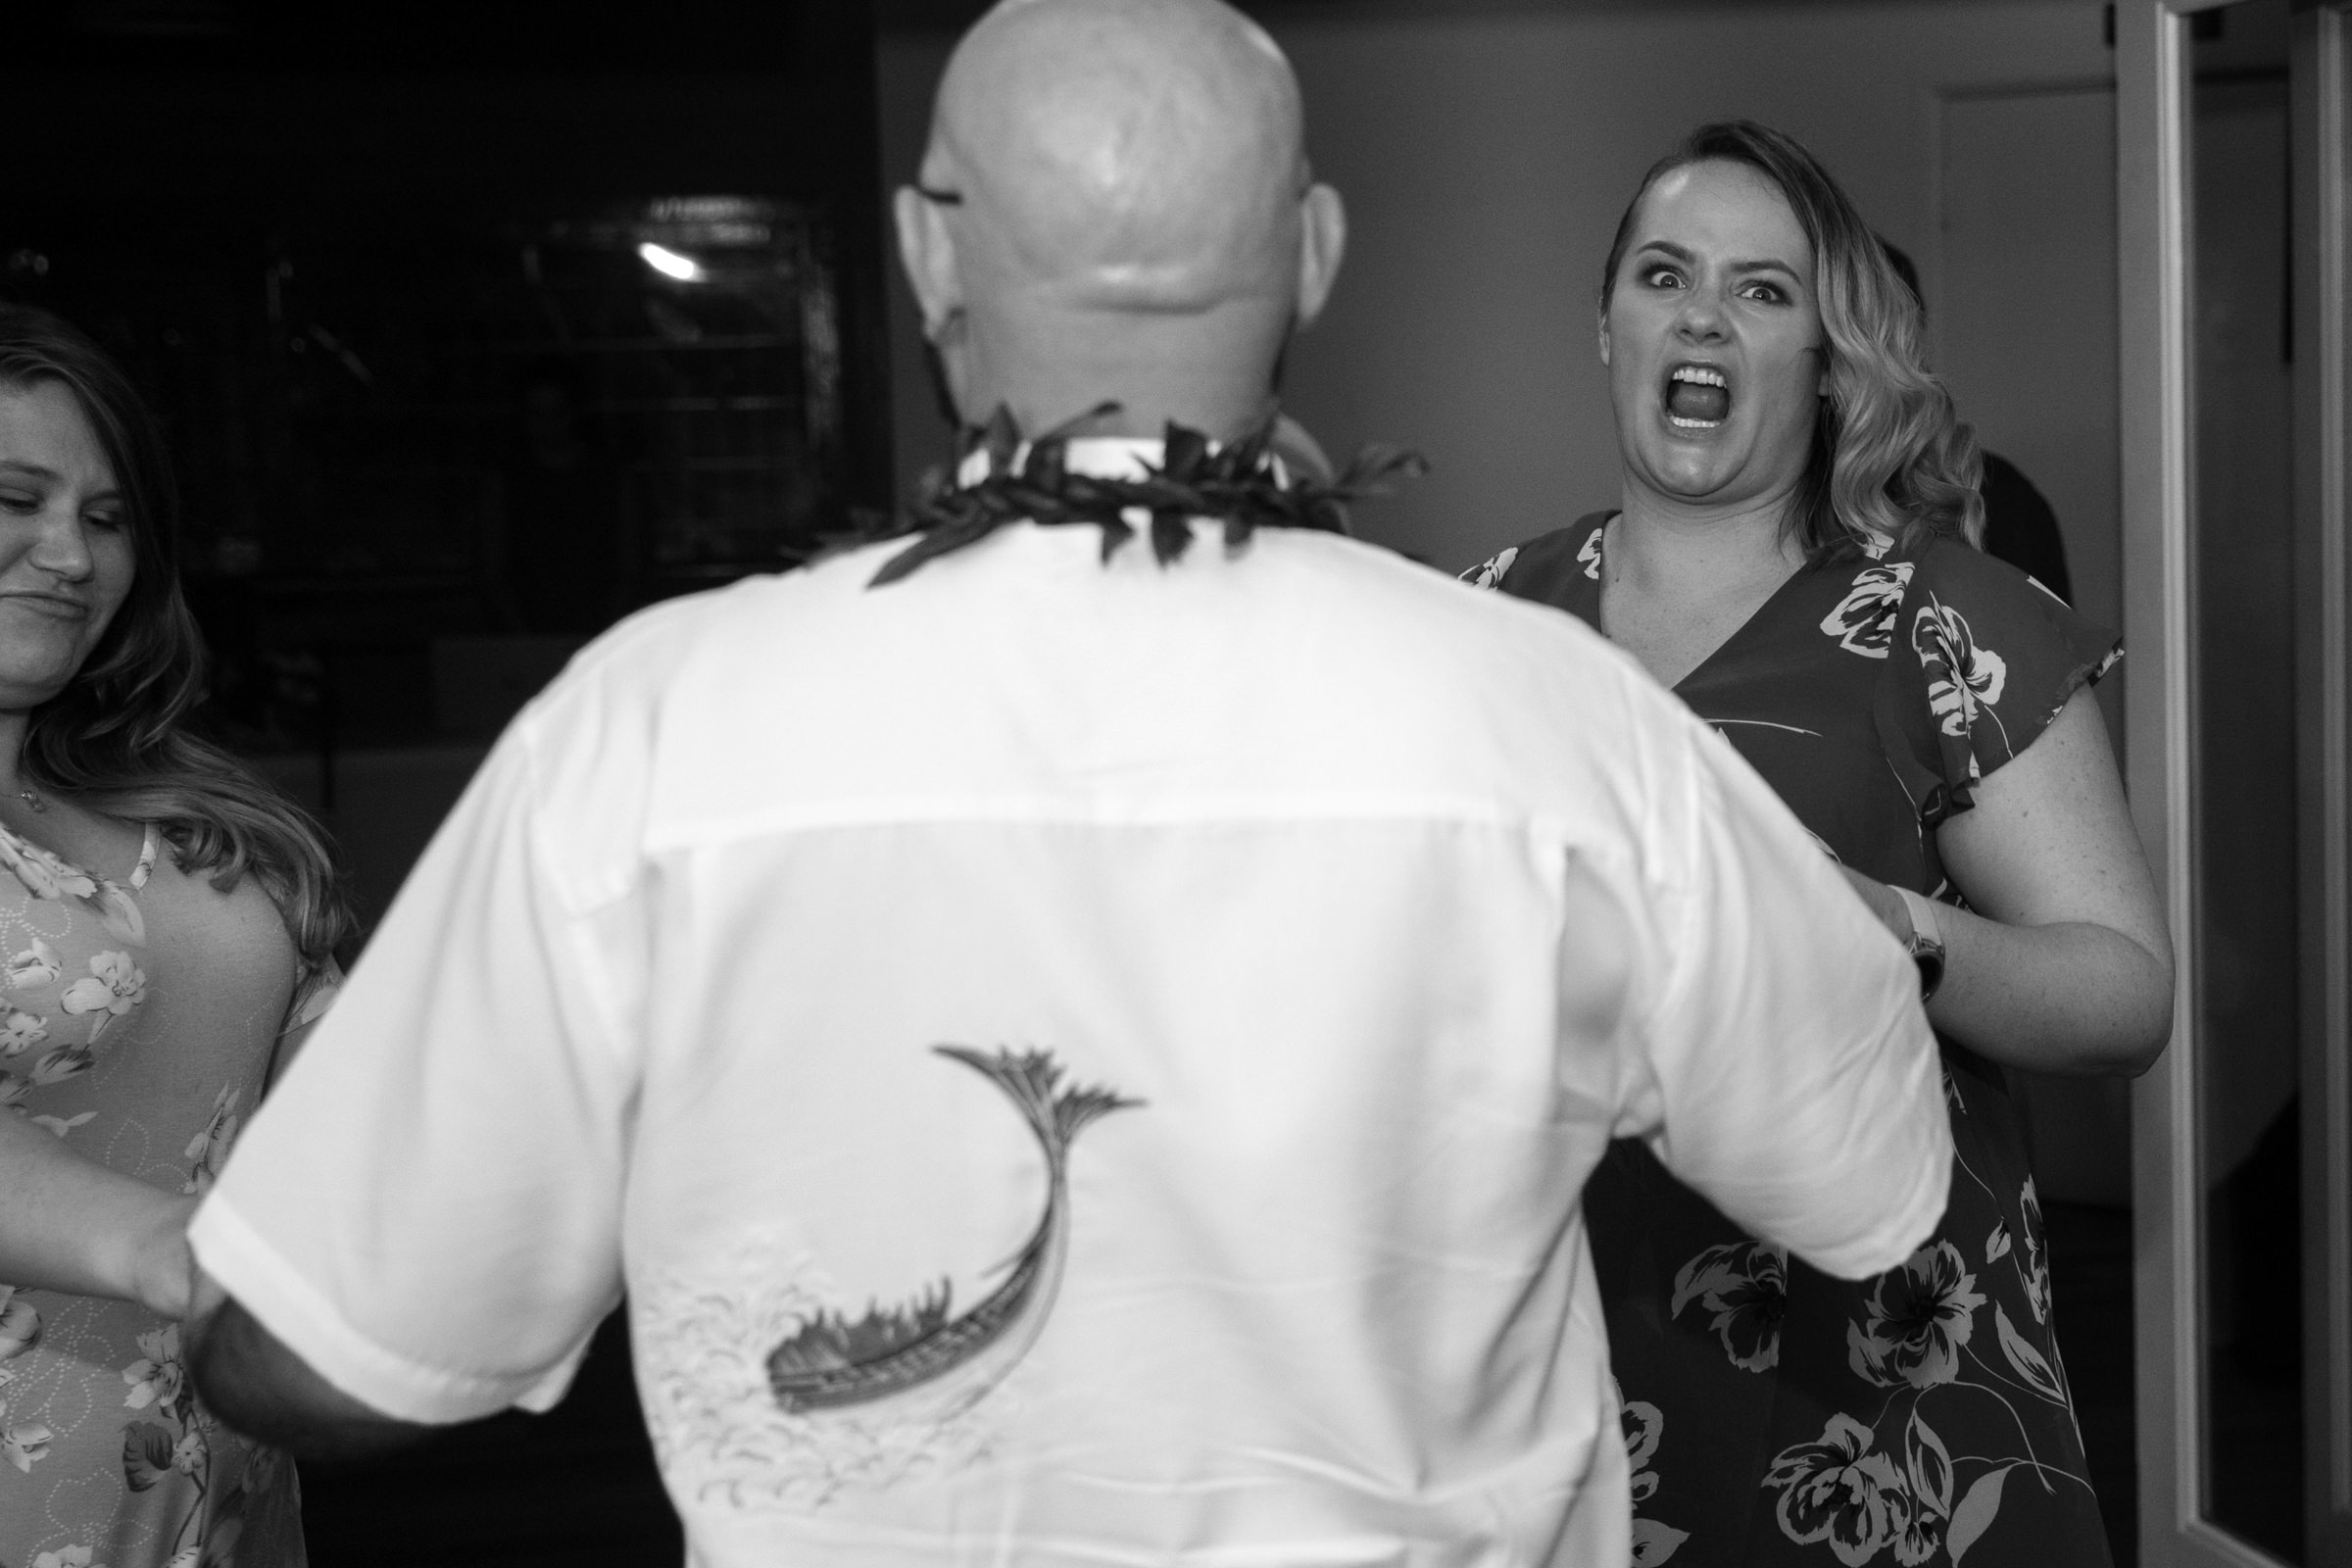 wedding-photographer-photography-destination-hawaii-lake-tahoe-reception-cake-cutting